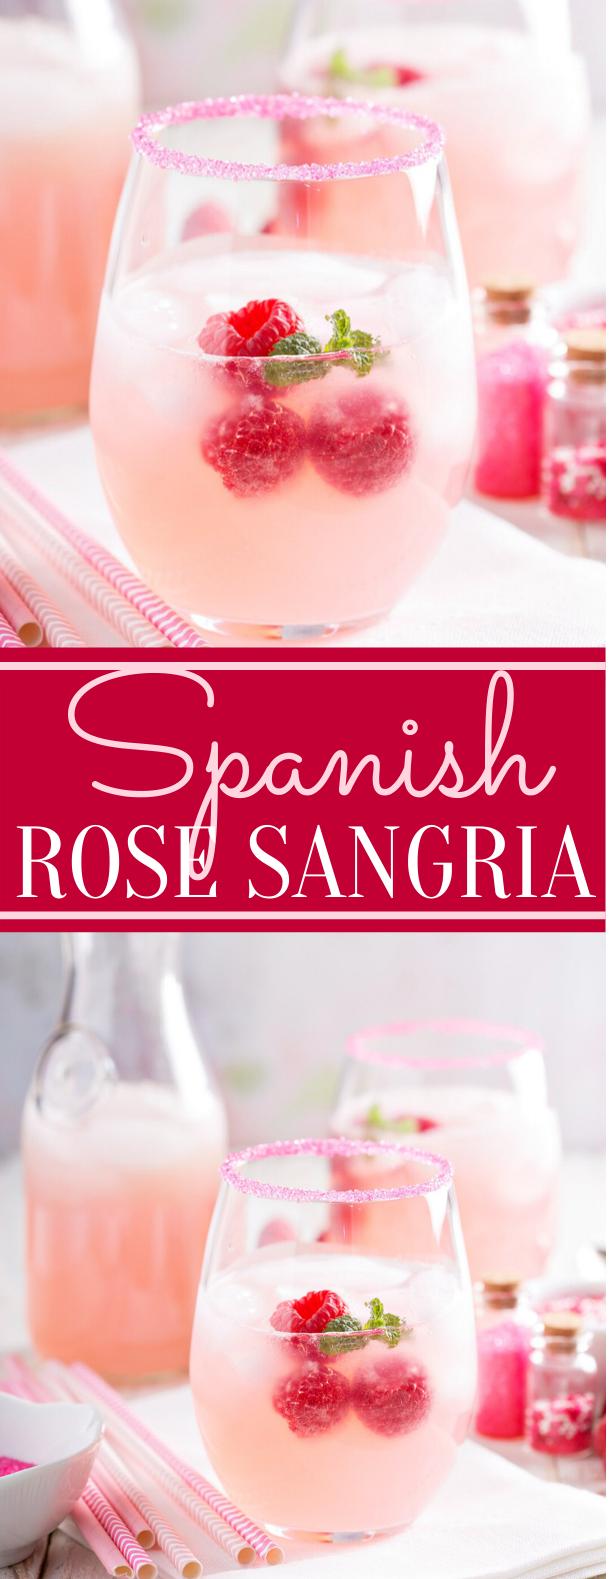 SPANISH ROSE SANGRIA #drinks #freshdrink